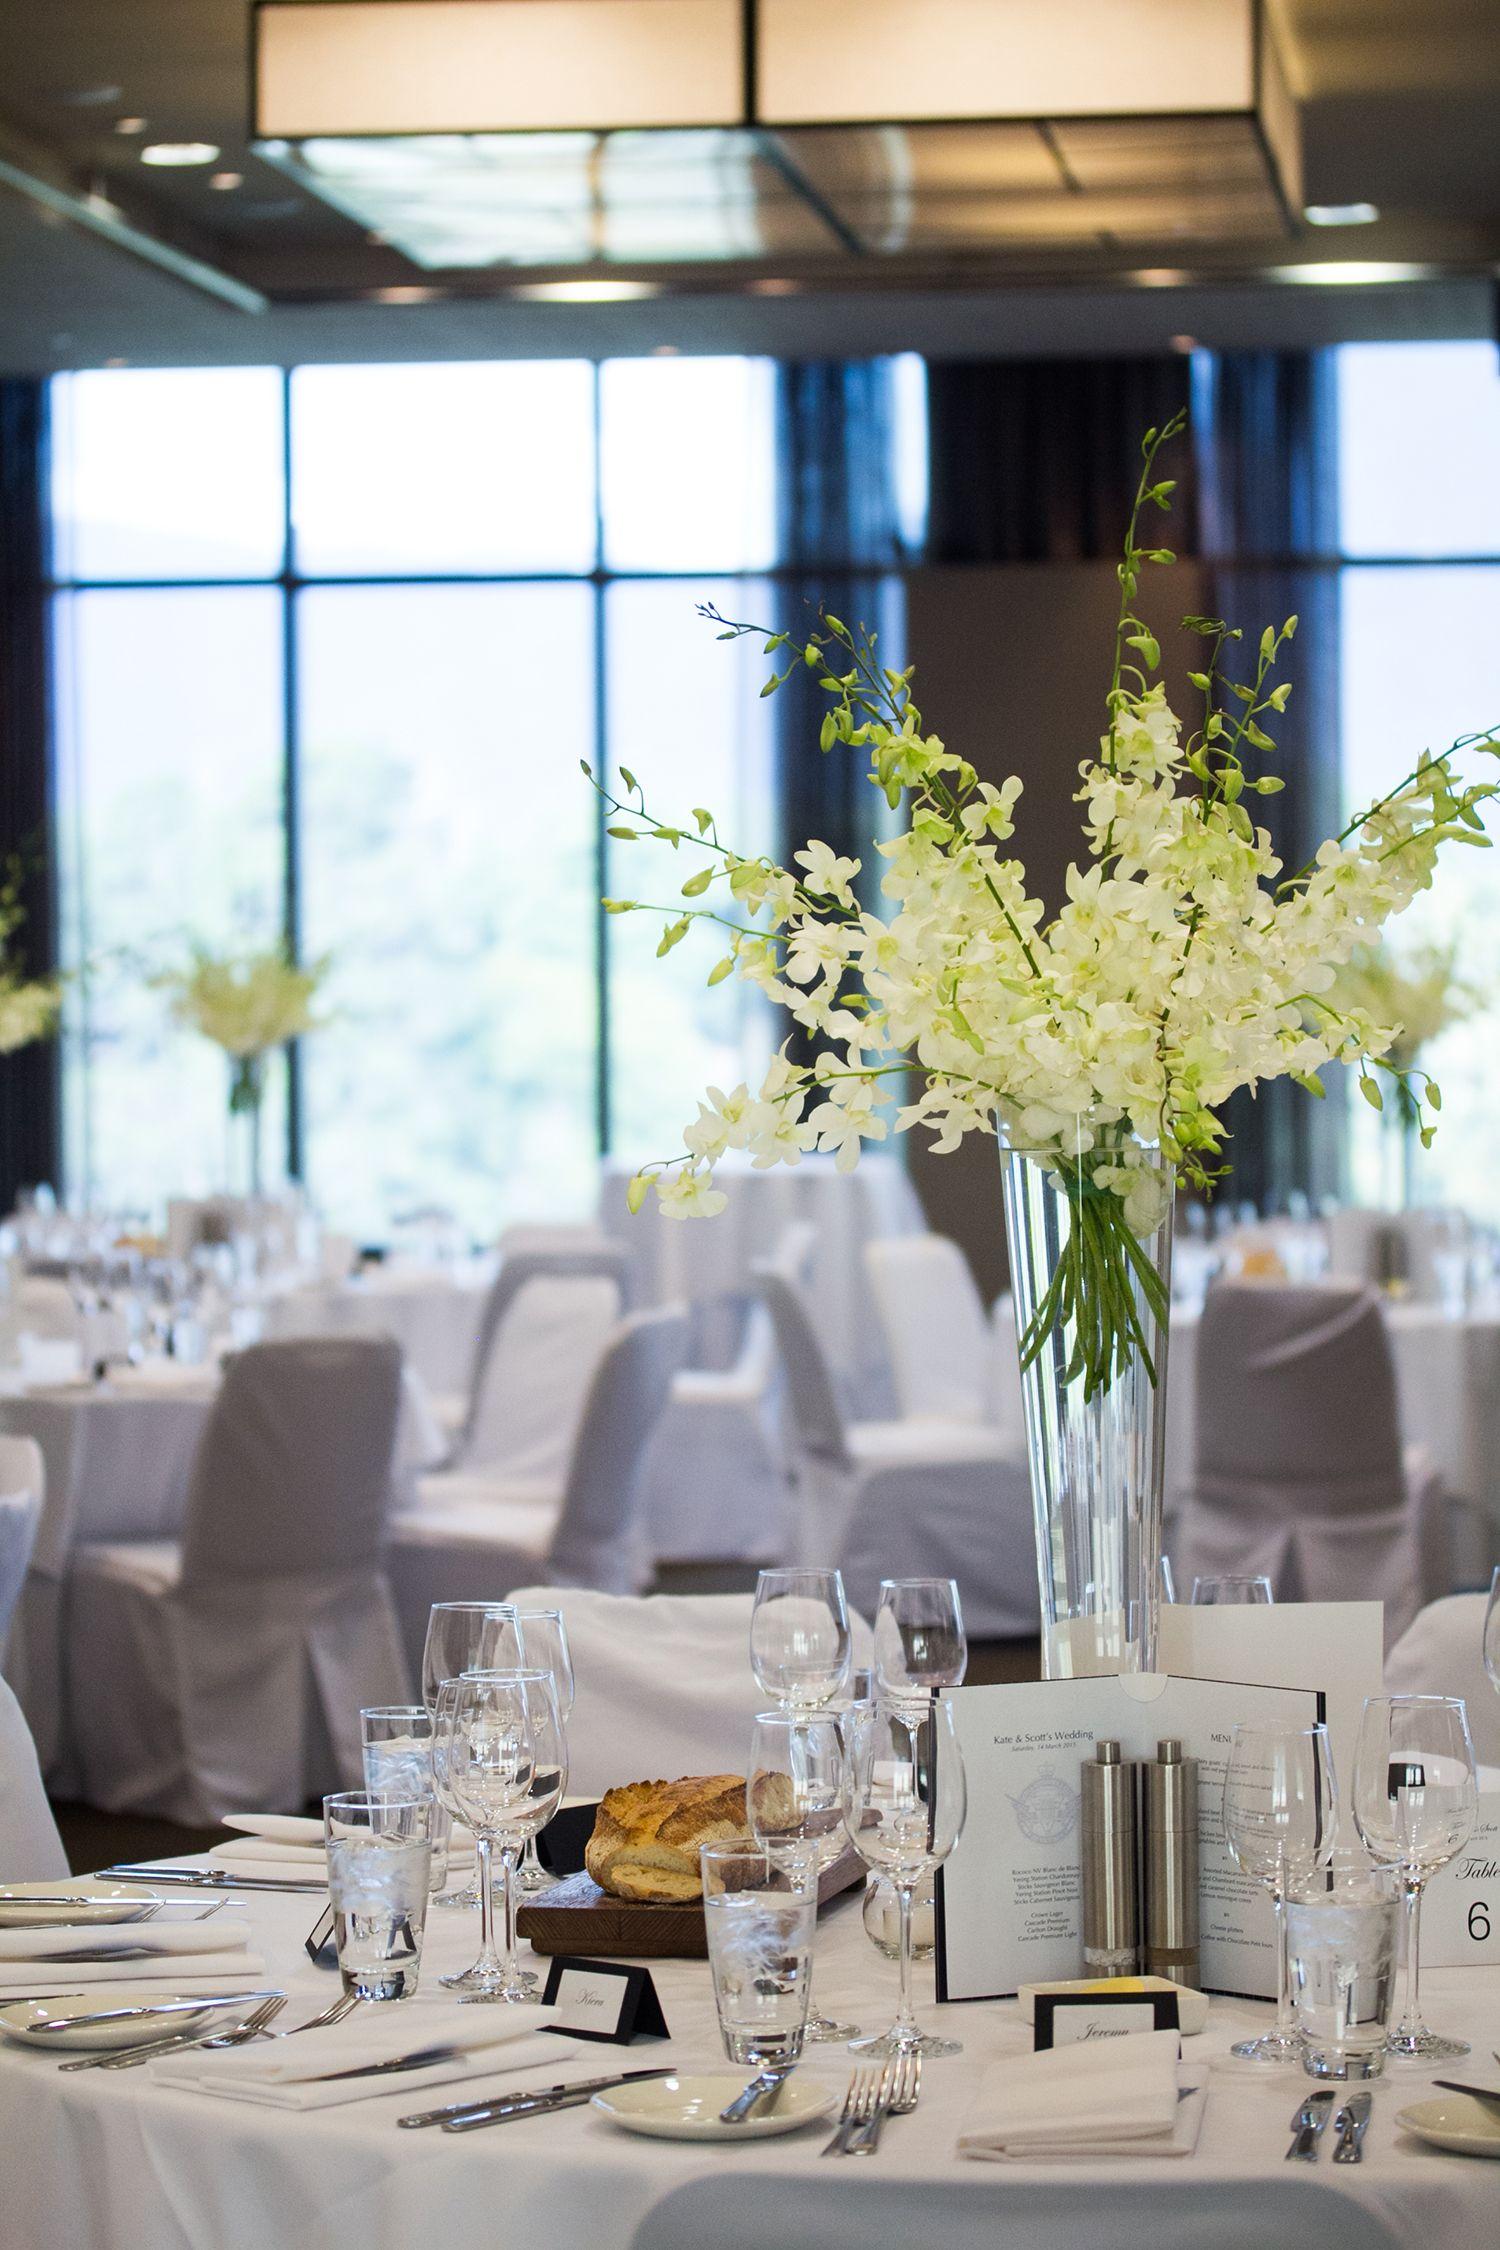 Racv healesville country club wedding venue real wedding photos